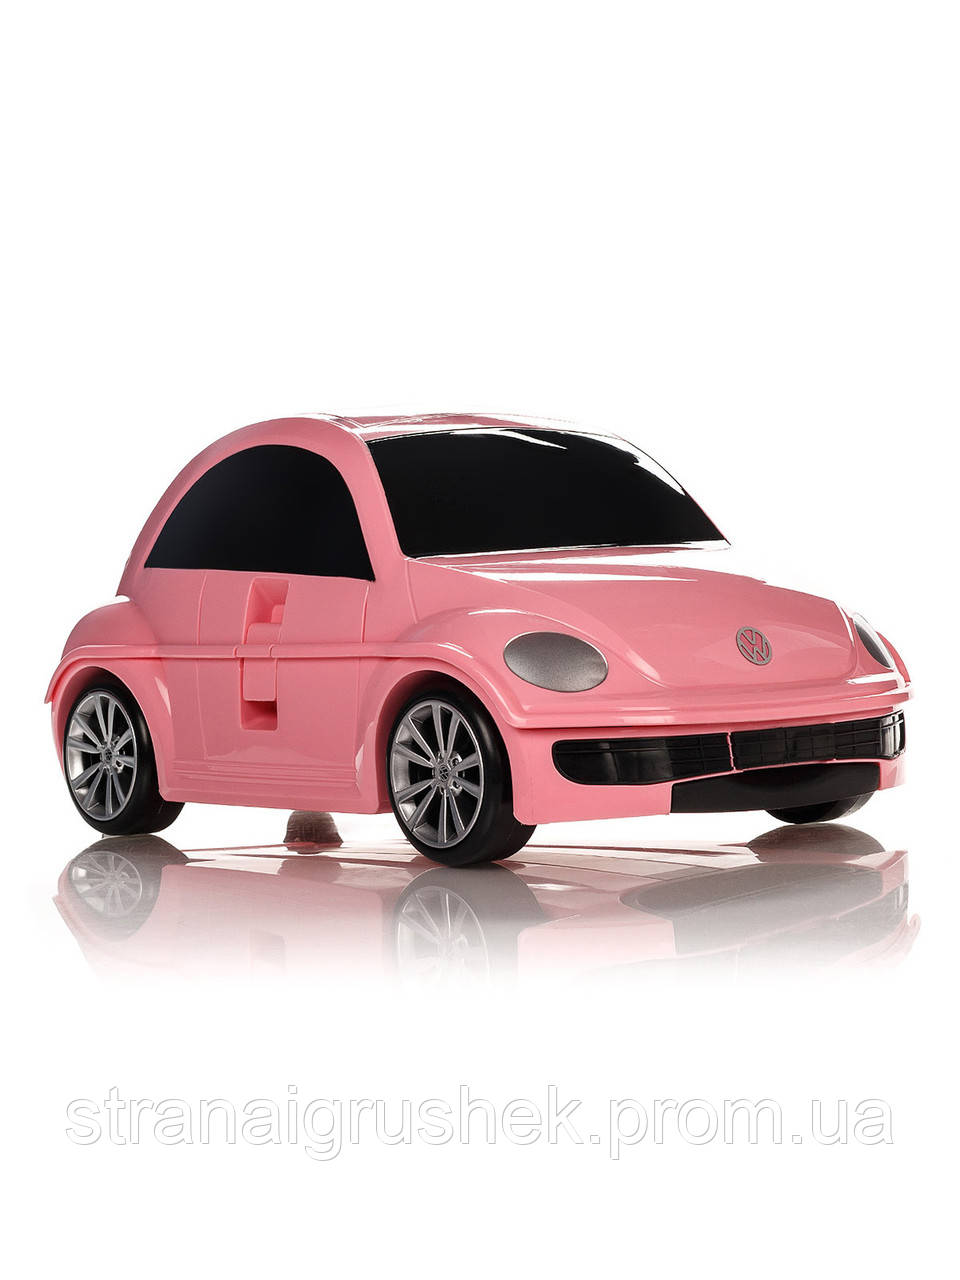 Детский чемодан на колесиках Ridaz Volkswagen Beetle розовый (91003W-PINK) 177dbdc6ea6